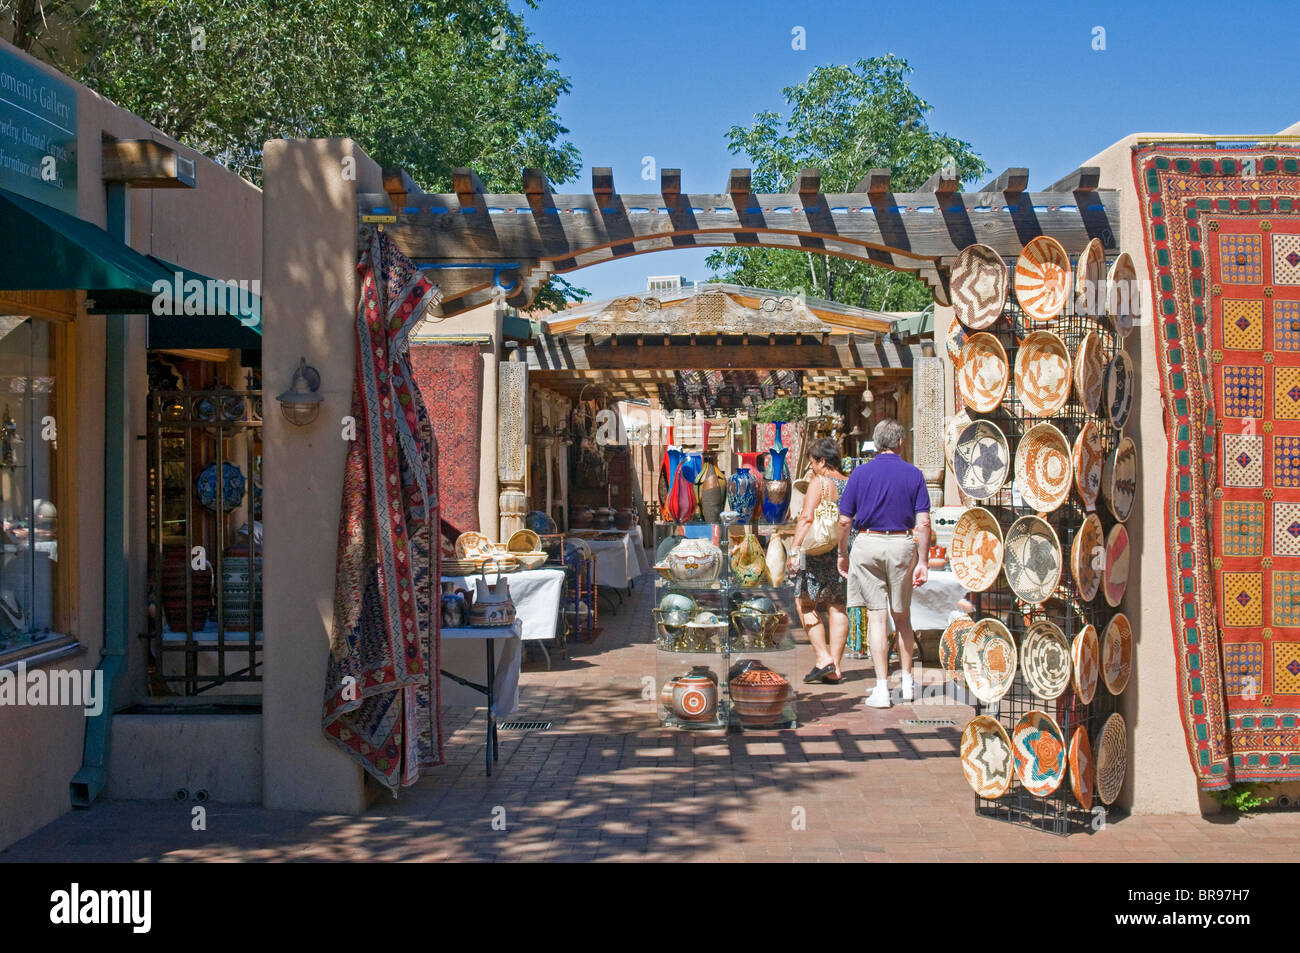 Indian Restaurant In Santa Fe New Mexico